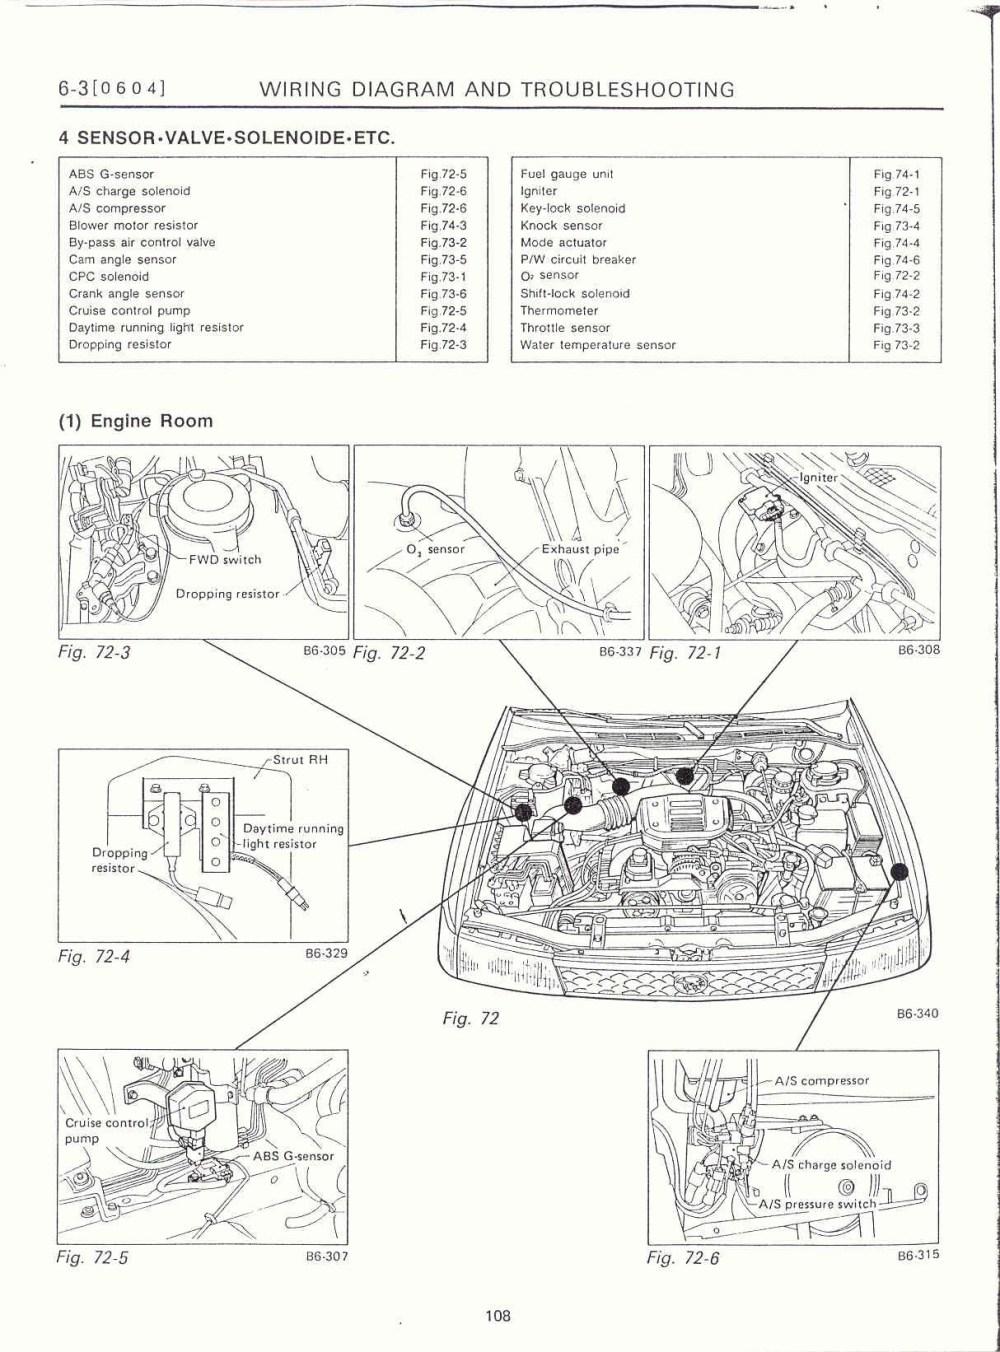 medium resolution of 2002 subaru impreza parts diagram u2022 wiring diagram for free 2001 subaru outback engine diagram subaru h6 engine diagram